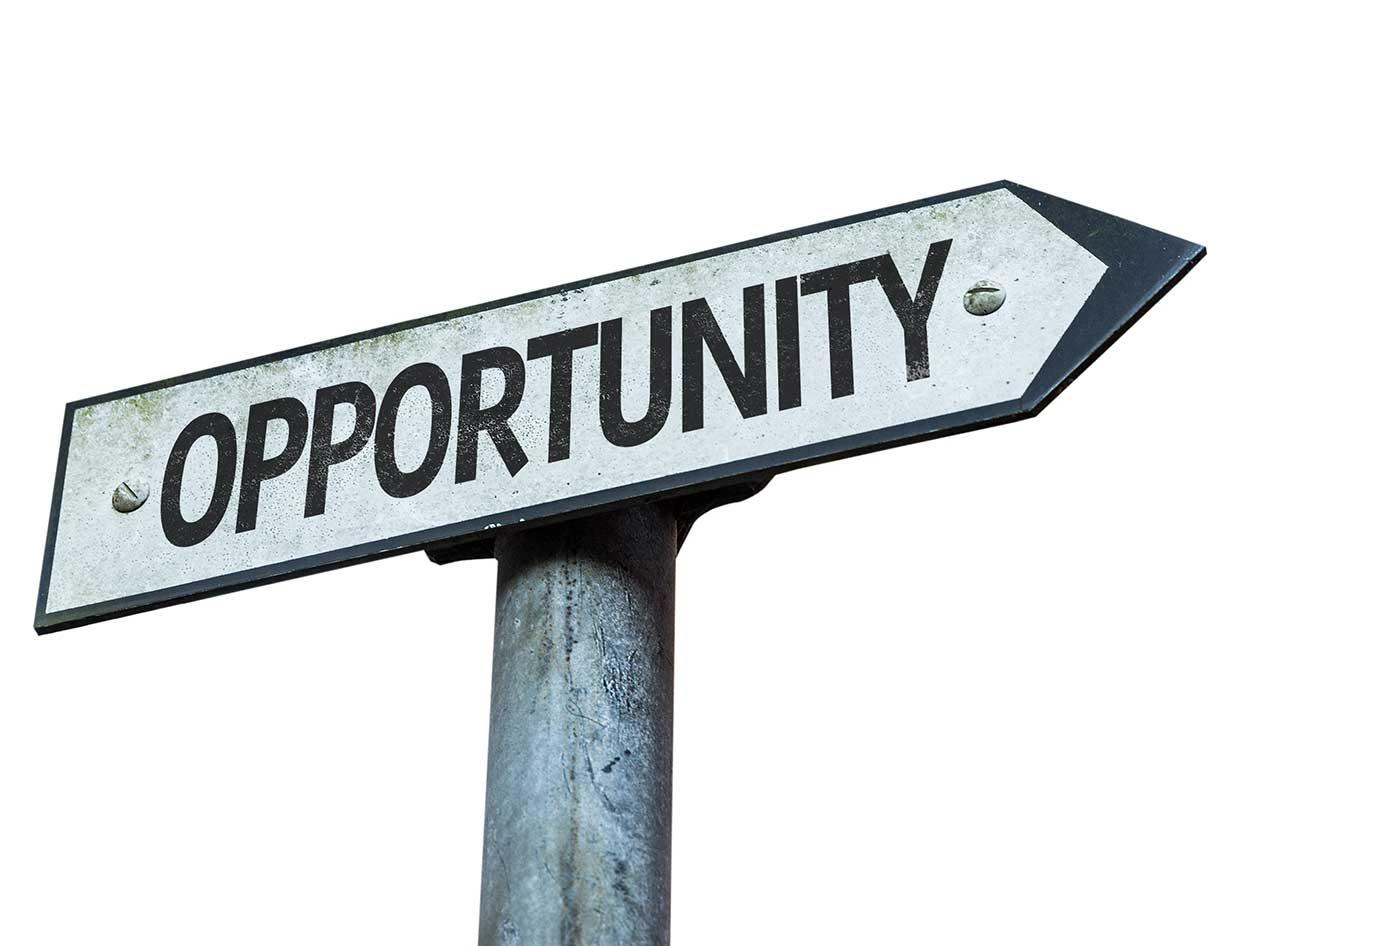 Assessing New Business Opportunities